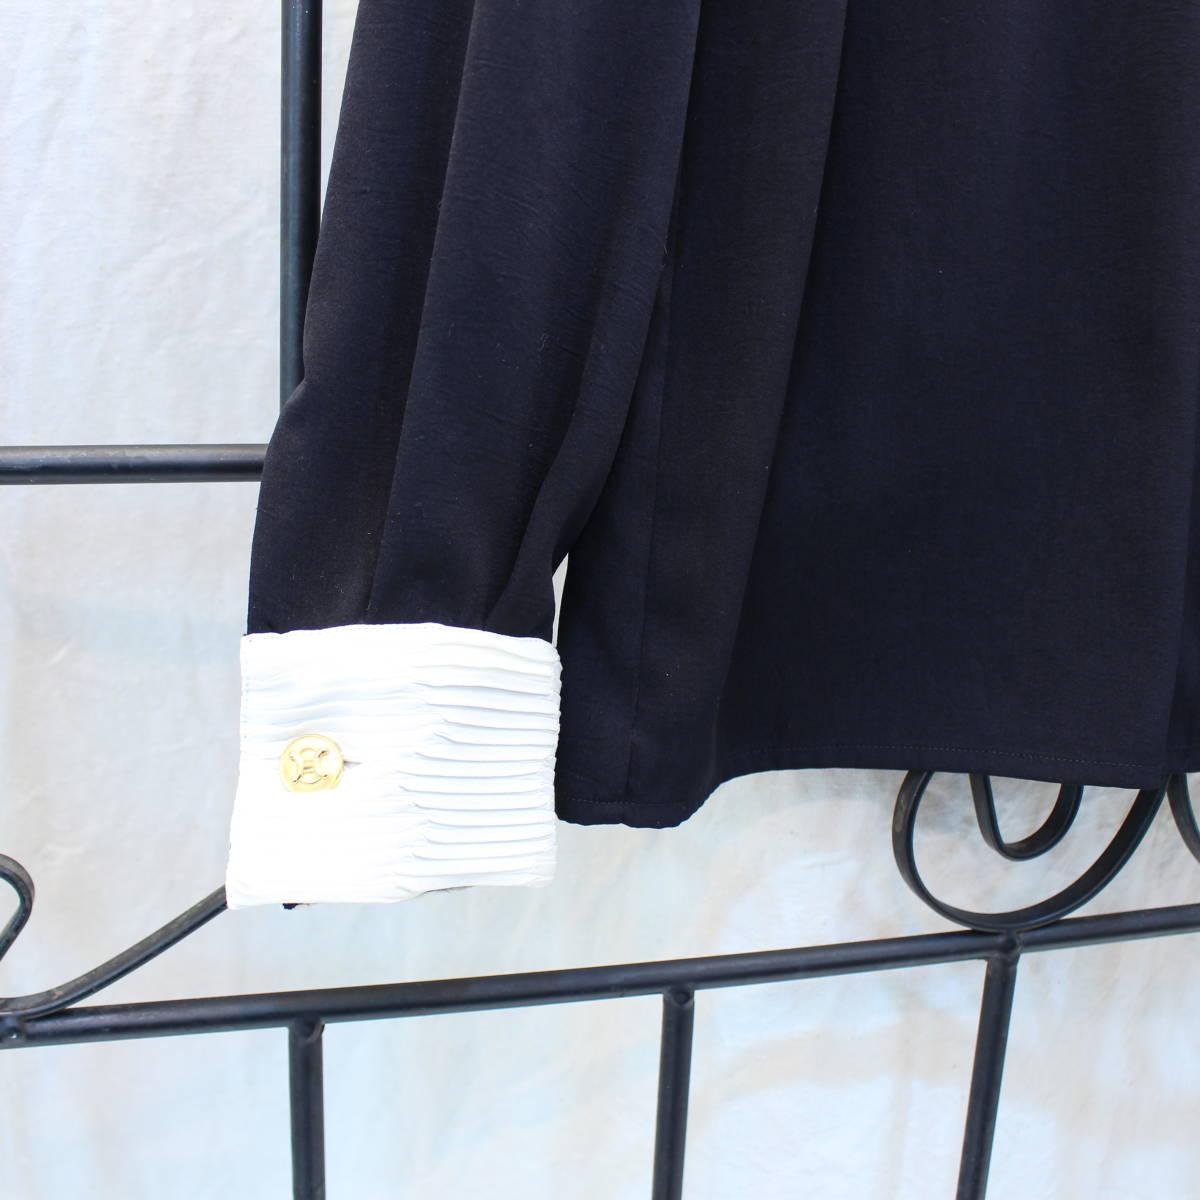 CELINE GOLD BUTTON LONG SLEEVE SHIRT MADE IN FRANCE/セリーヌ金ボタン長袖シャツ_画像3